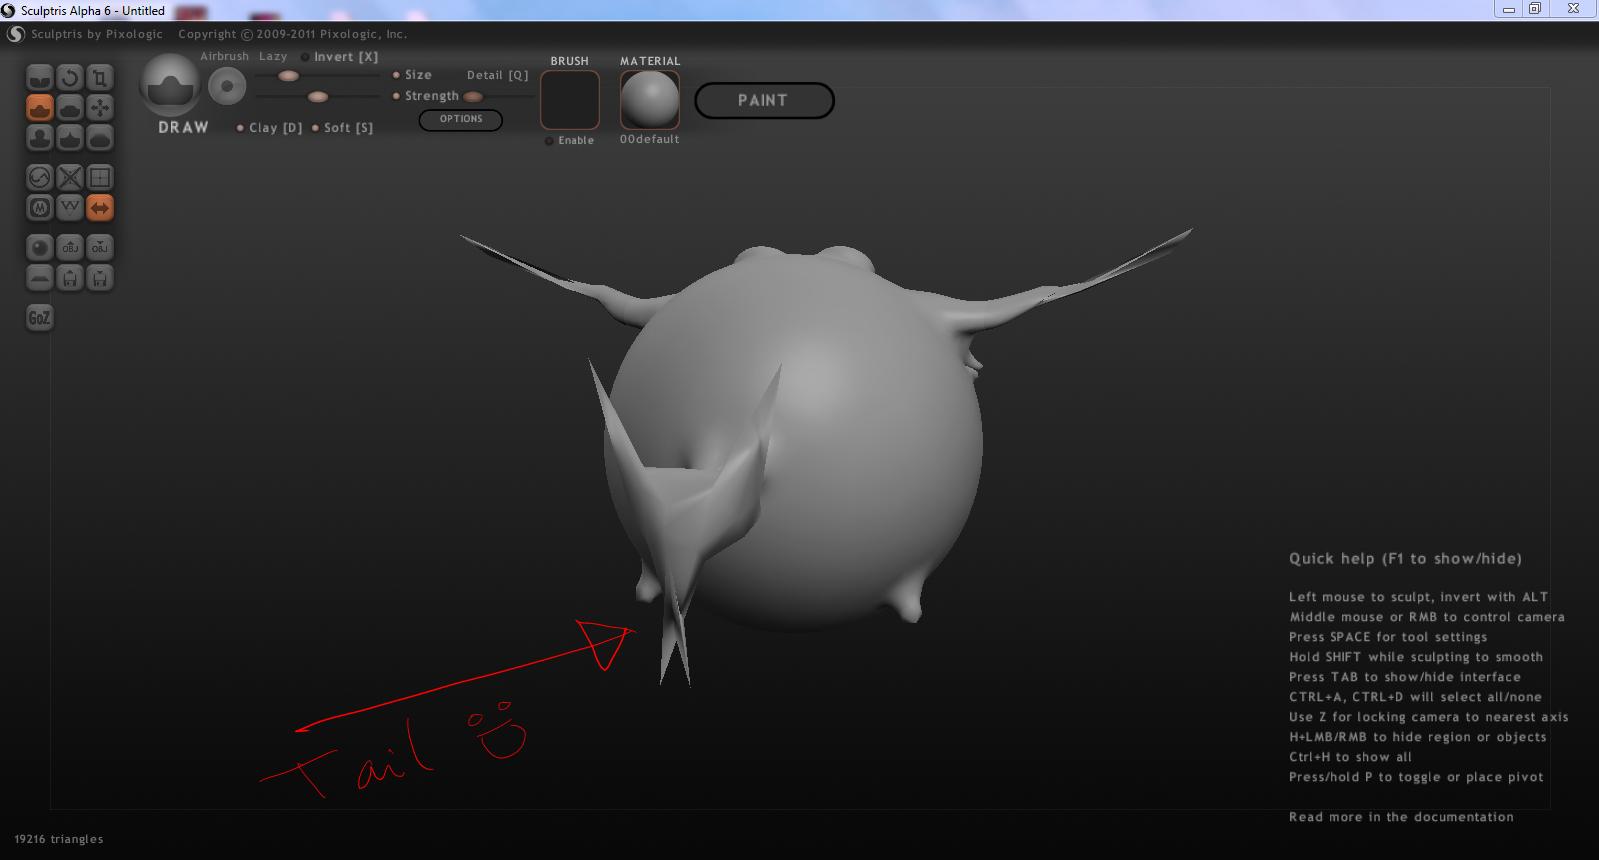 Blender + Sculptris + Wings3D + Google Sketchup + Poser